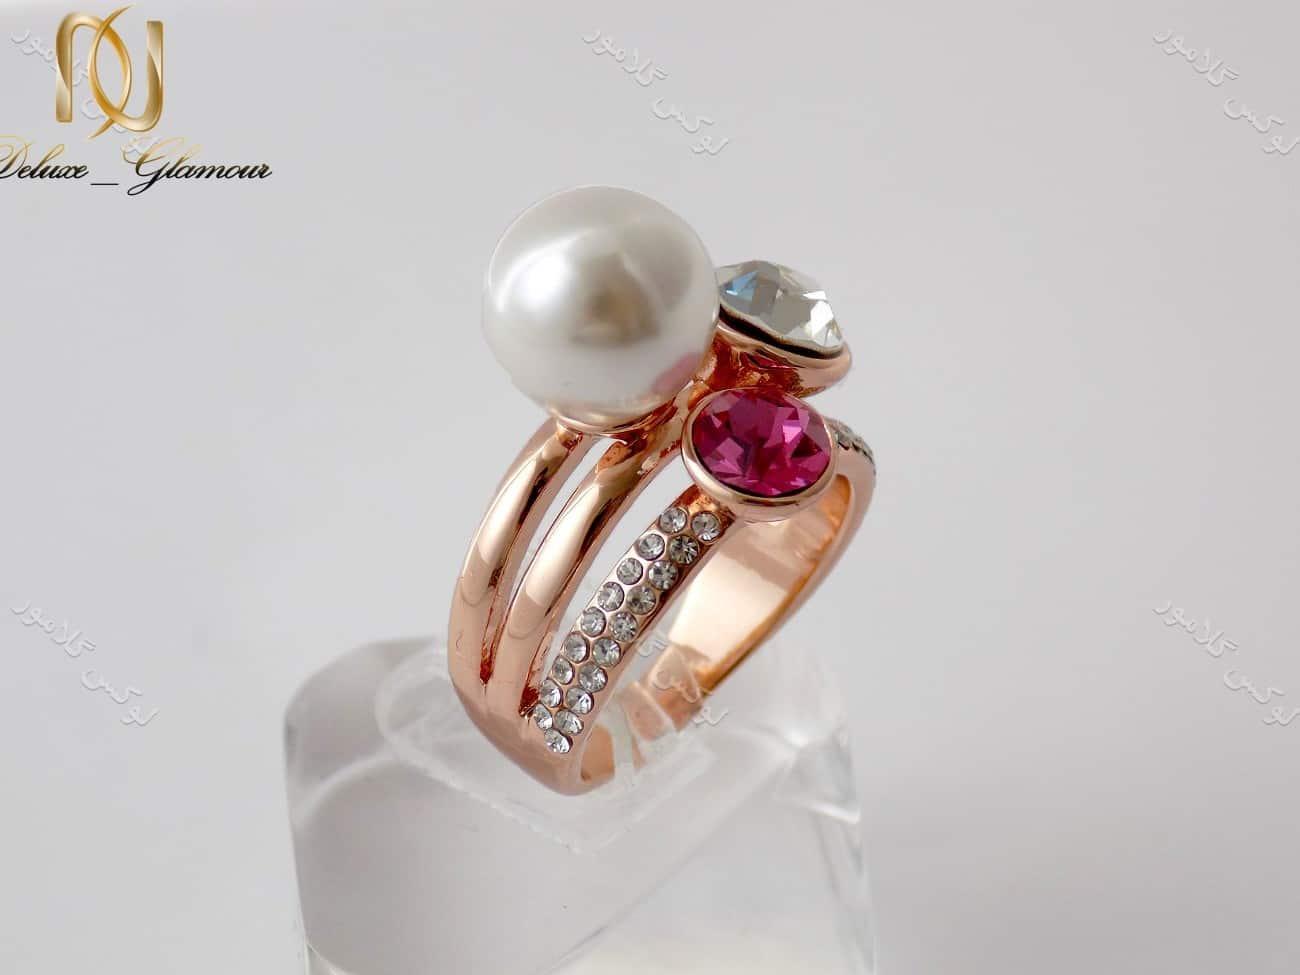 انگشتر دخترانه سه ردیفه کلیو با کریستال بنفش و هفت رنگ ng-n131